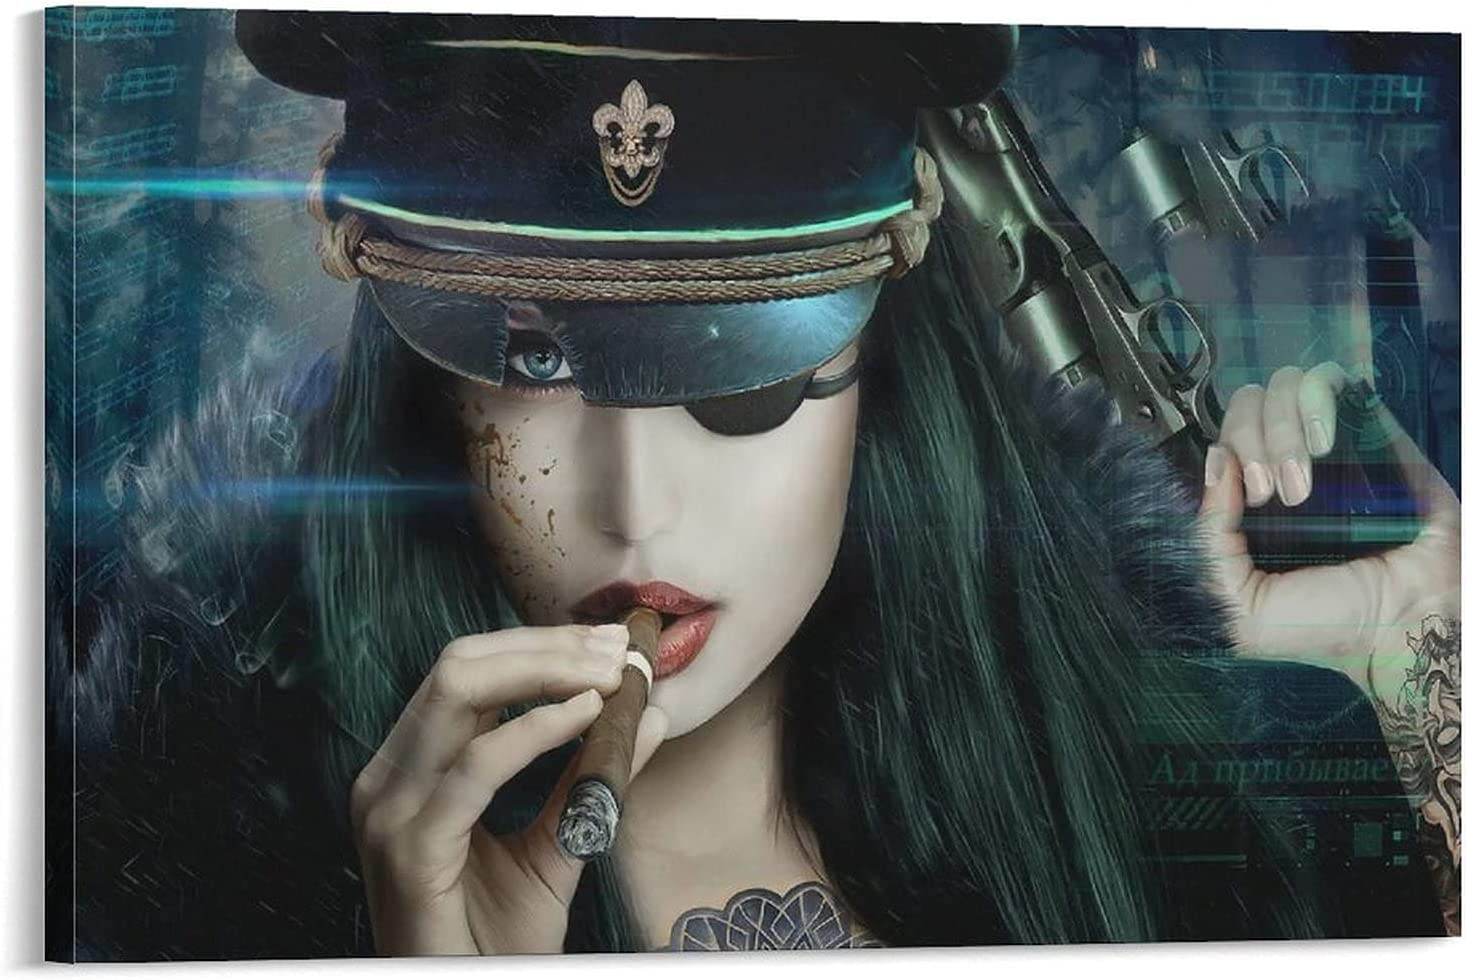 YuFeng_Art_Inn 2021 spring and summer new Digital Art Women Police Tattoo Fantasy Indefinitely Fanta